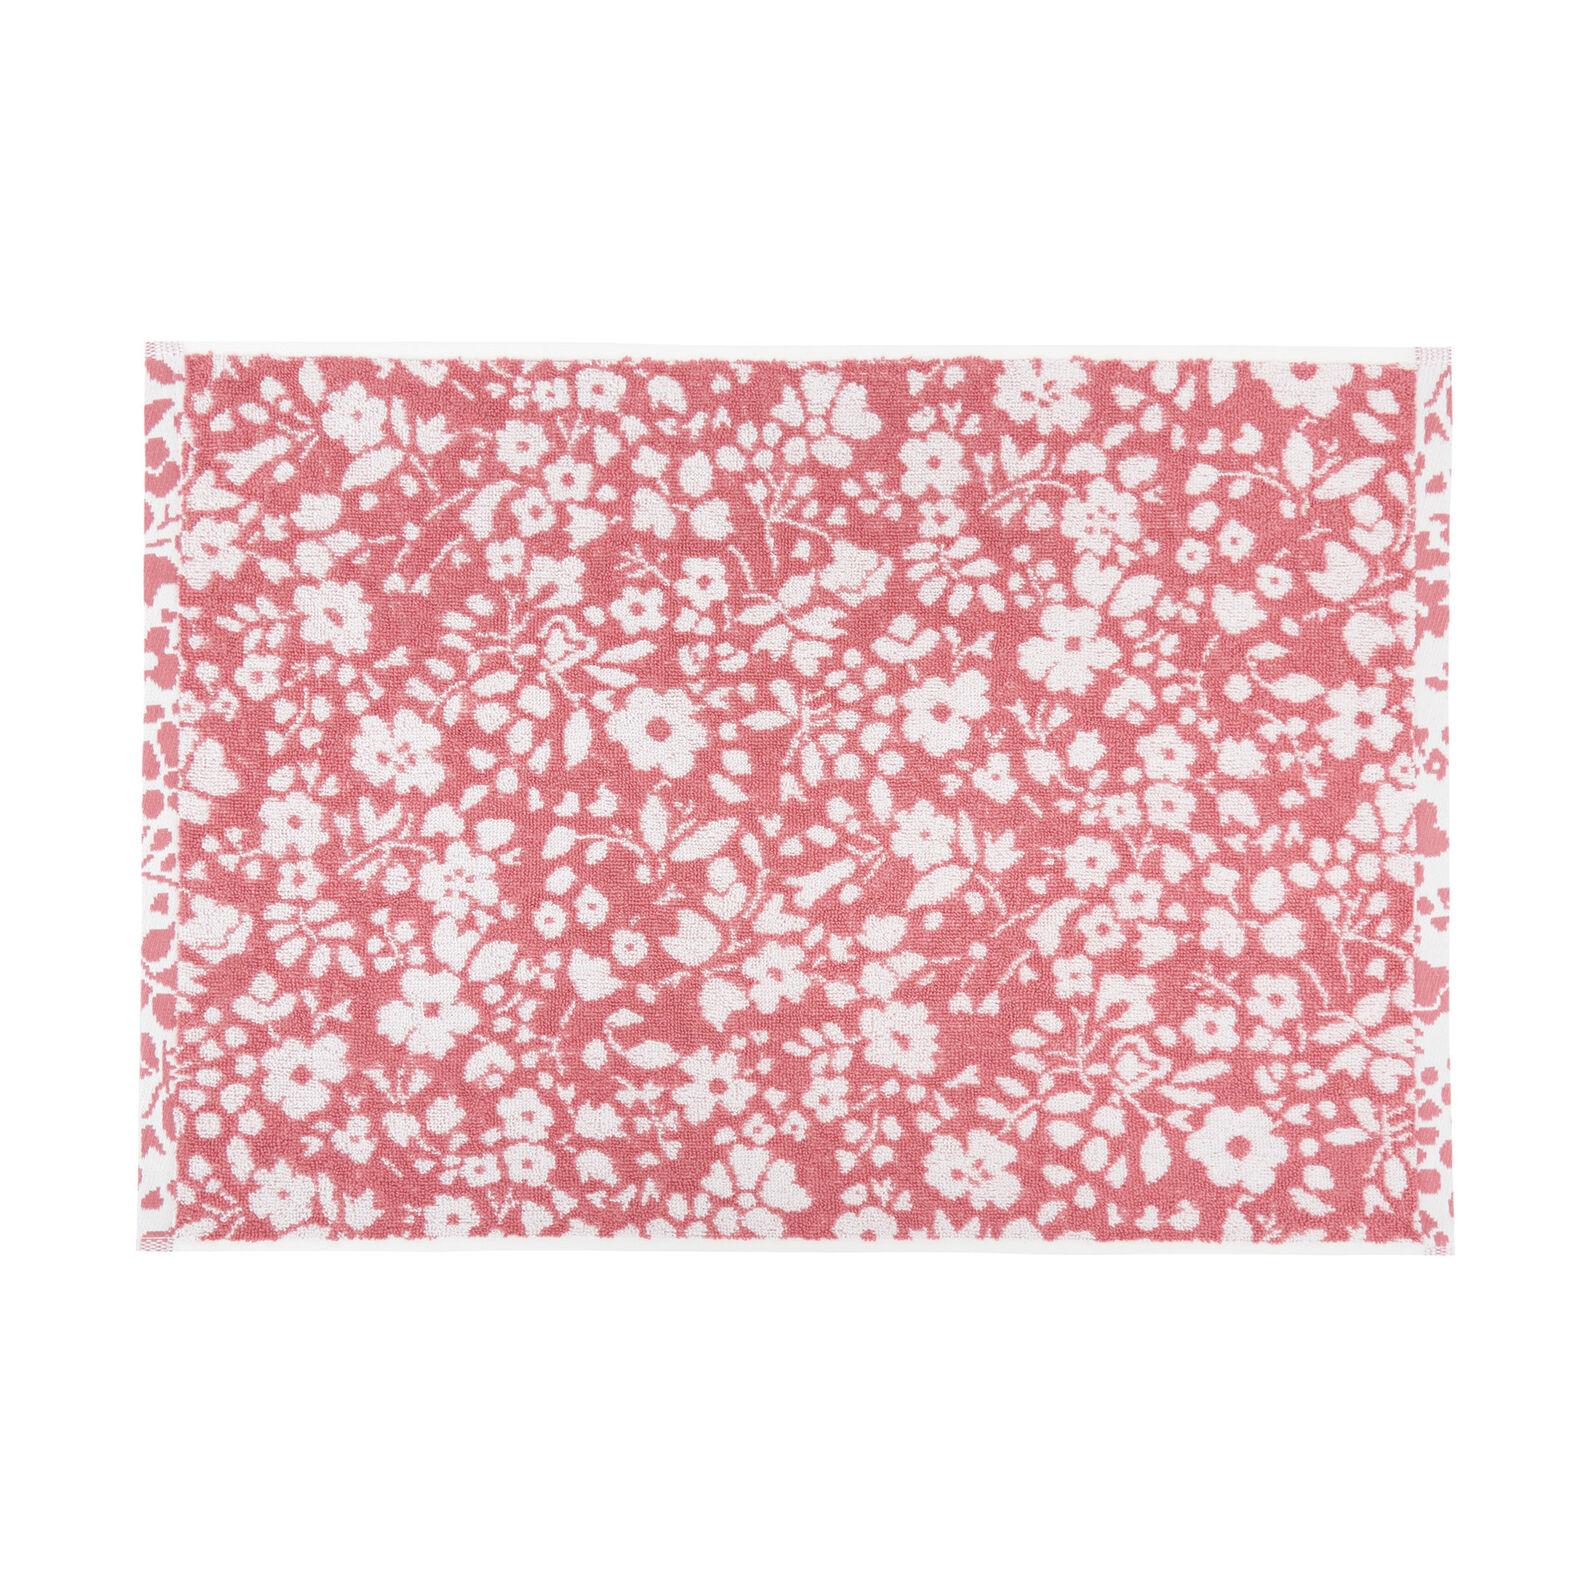 Asciugamano puro cotone fantasia floreale